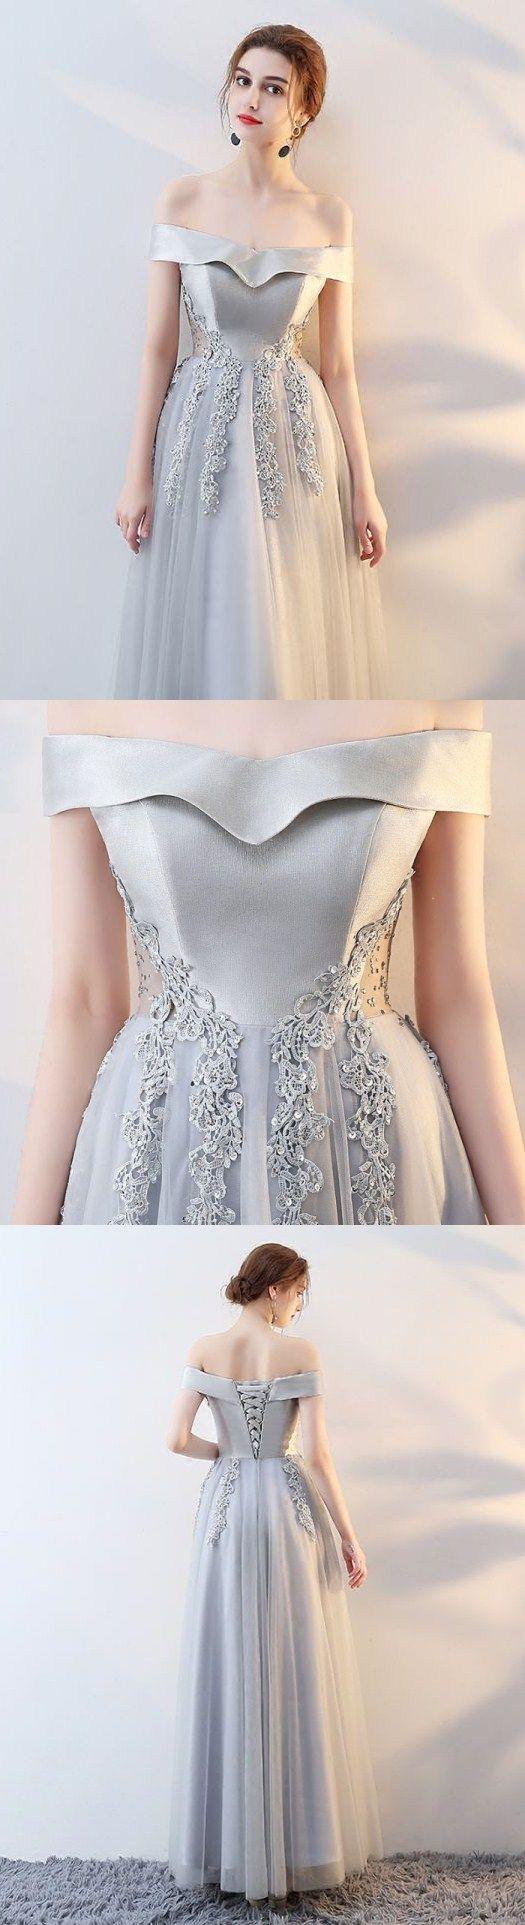 prom dresses long,prom dresses 2018,prom dresses modest #prom #eveningdresses #amyprom